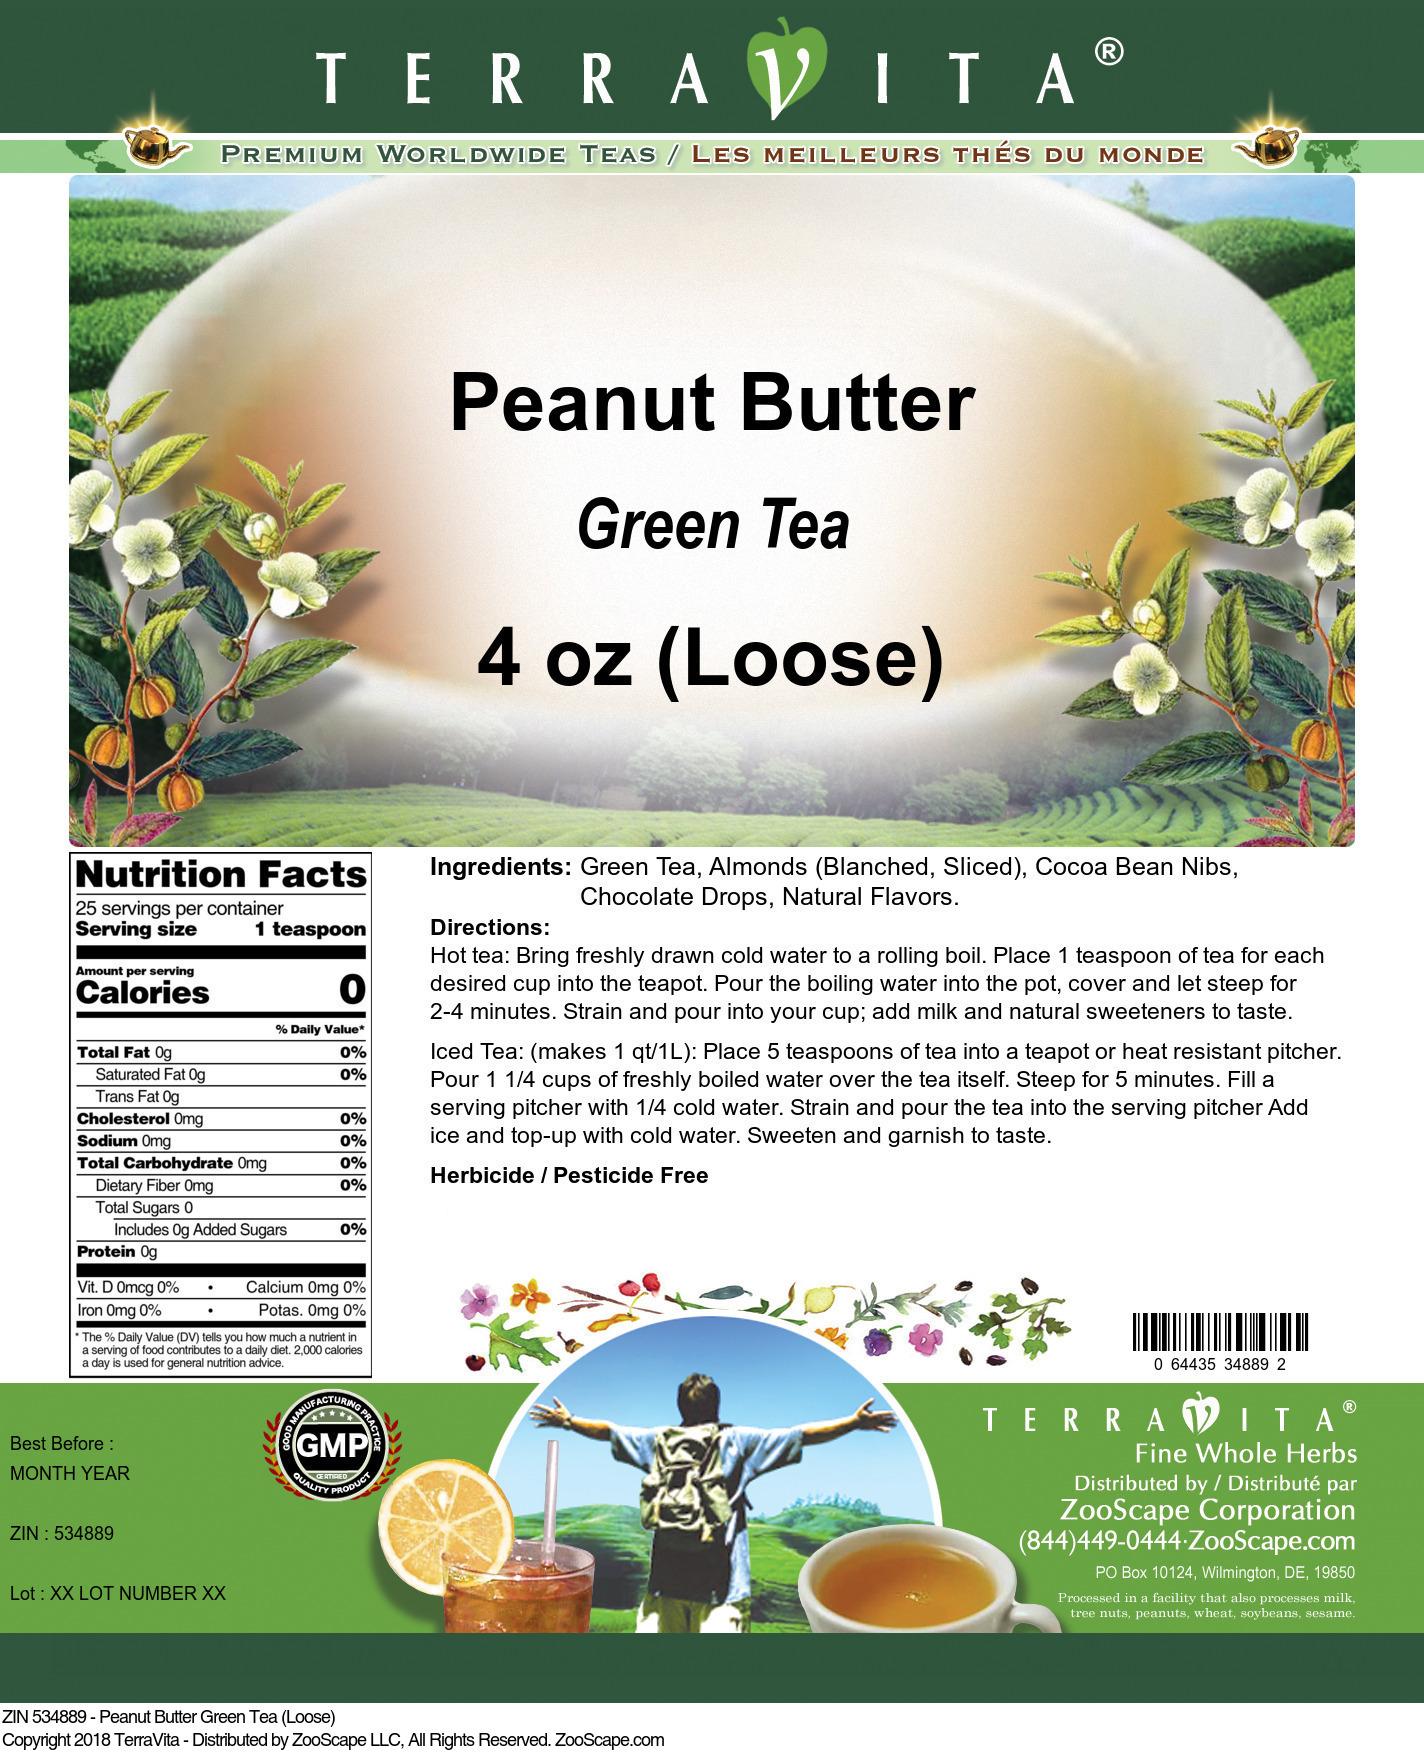 Peanut Butter Green Tea (Loose)